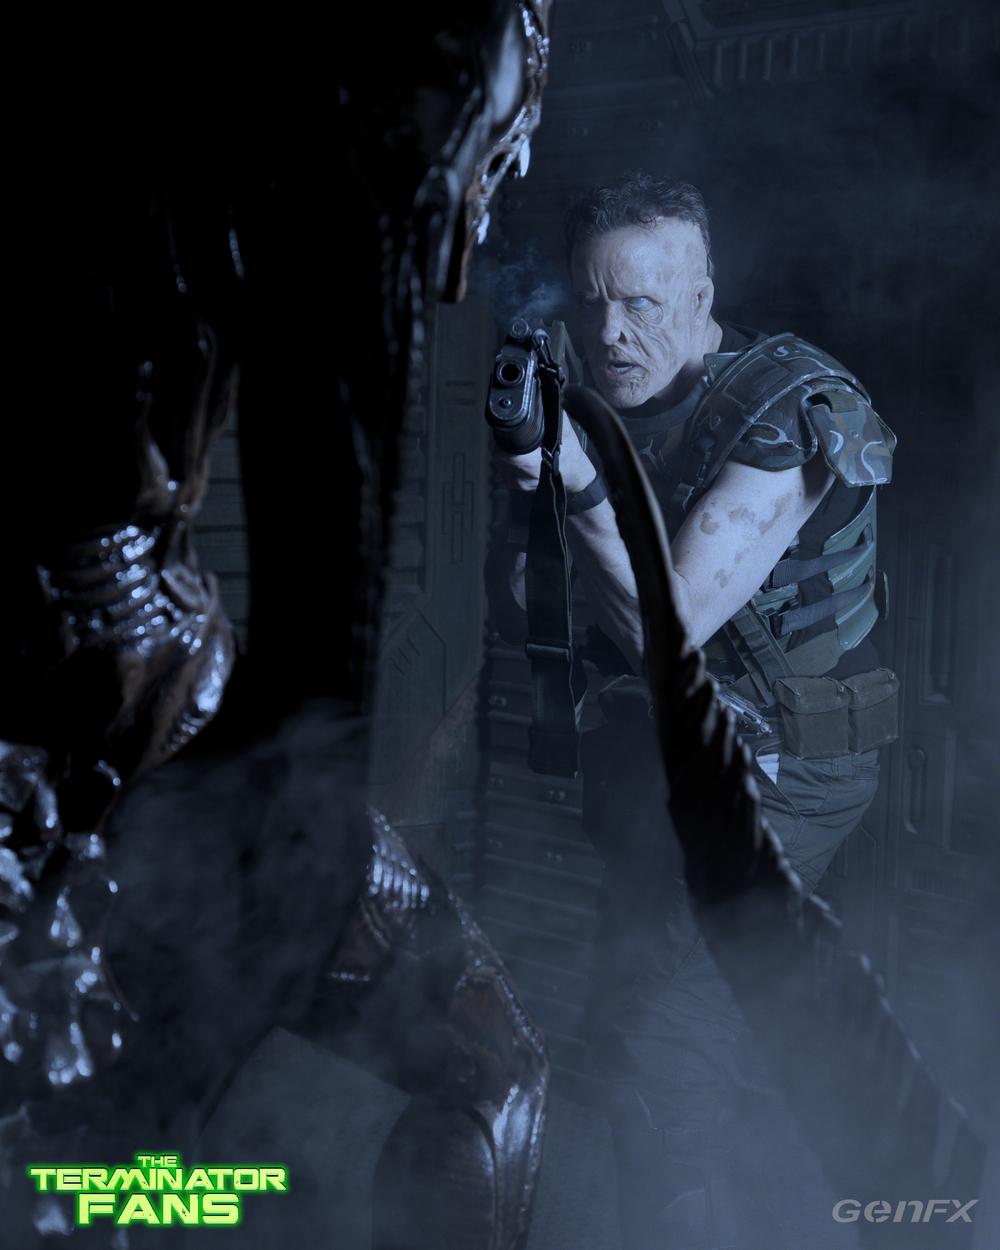 Alien Movie: Badass Makeup Test Photos For Corporal Hicks In New ALIEN